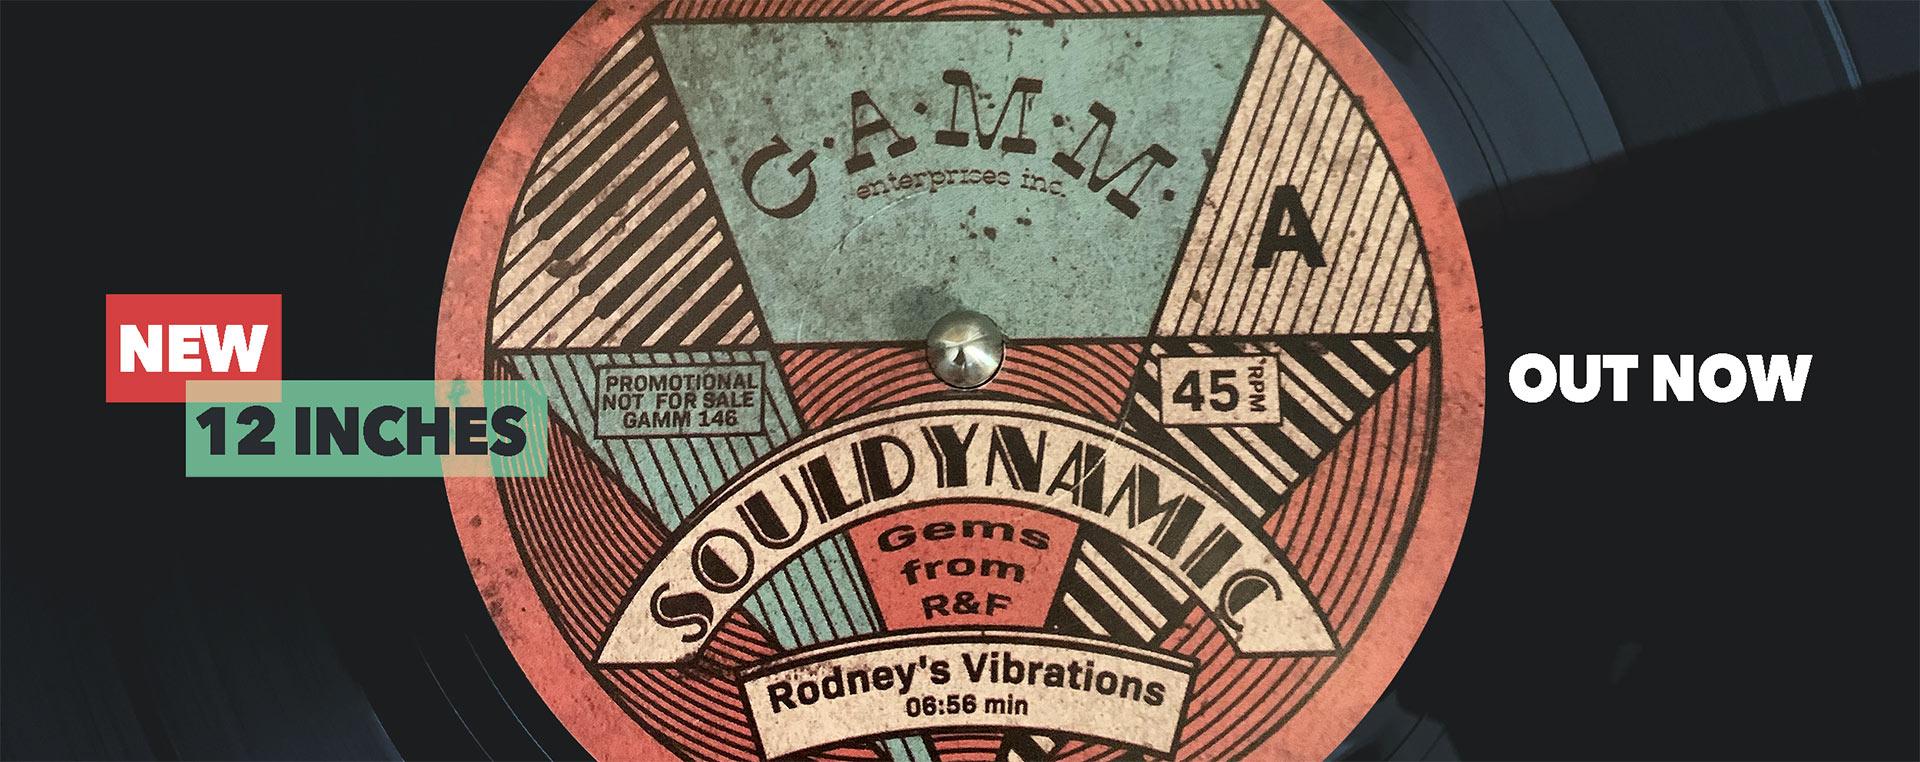 Souldynamic Gems from R&F Gamm Records